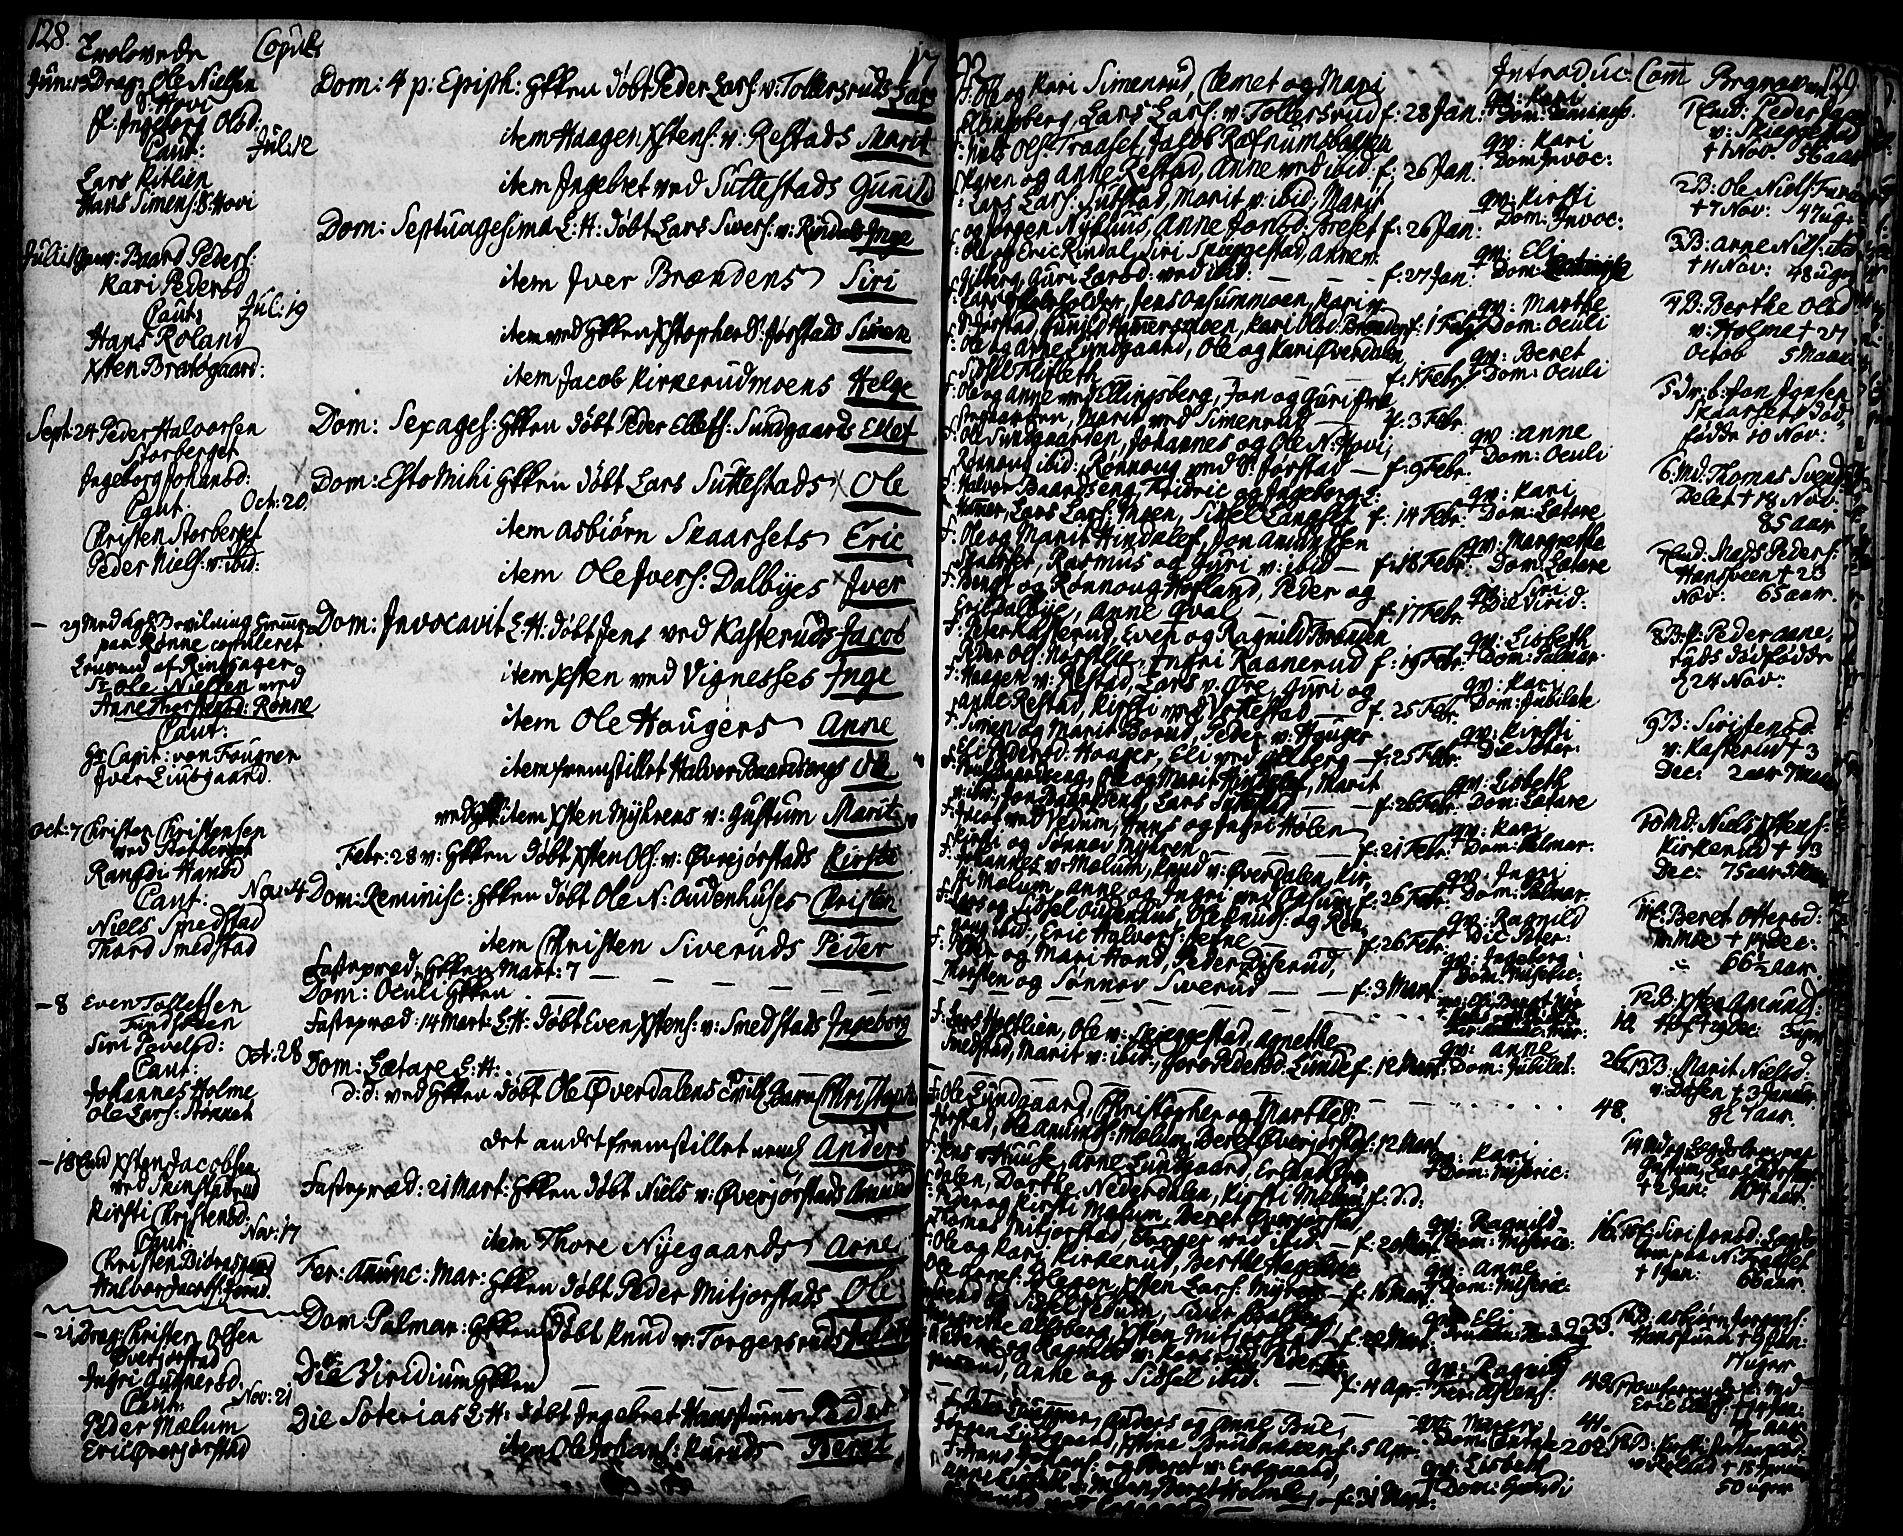 SAH, Fåberg prestekontor, H/Ha/Haa/L0002: Ministerialbok nr. 2, 1775-1818, s. 128-129